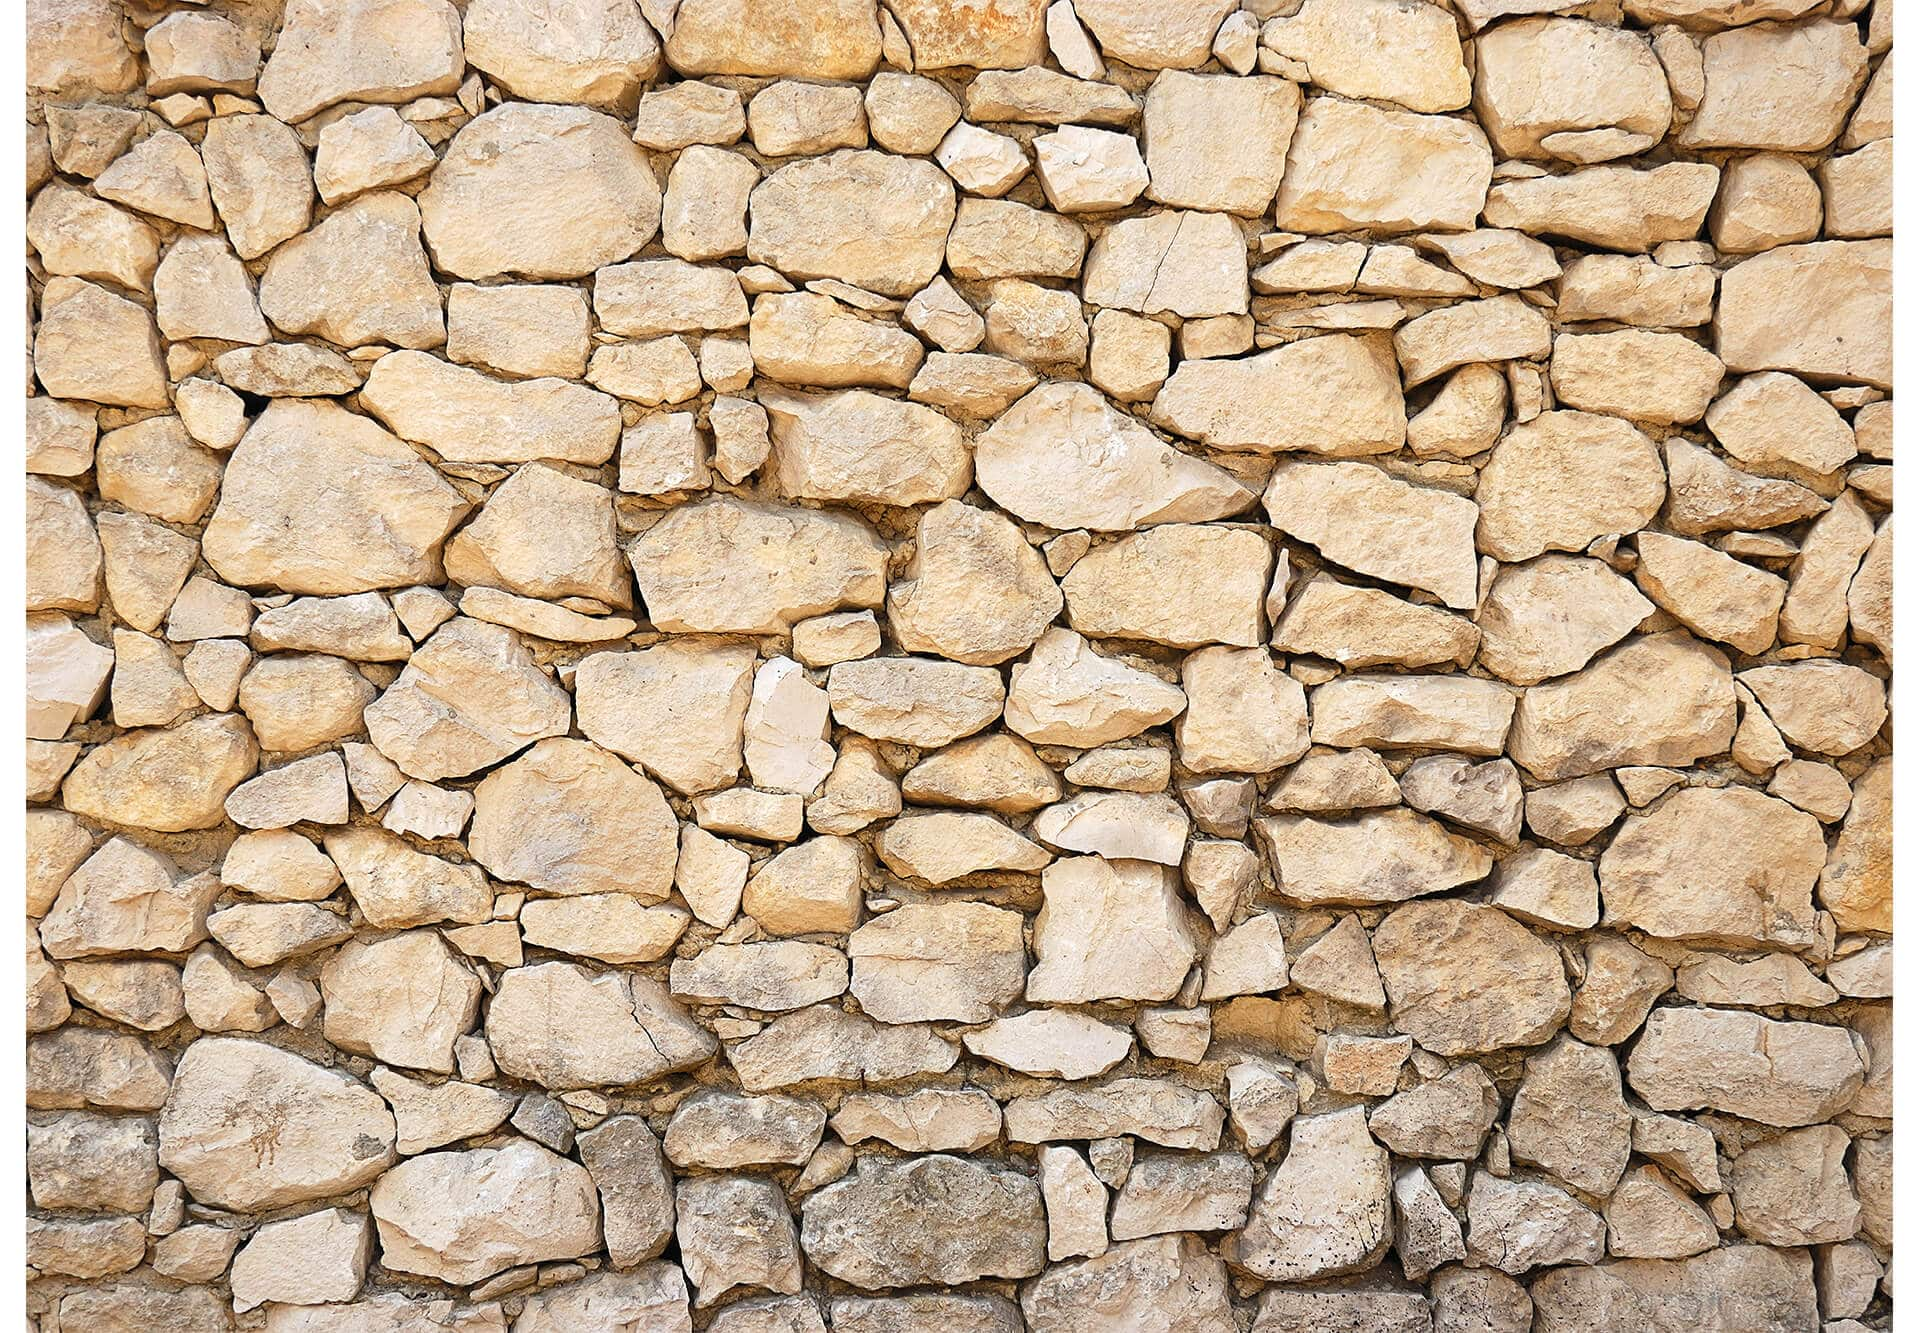 Fototapete mauer maueroptik als dekoration wall - Piedra natural para paredes ...